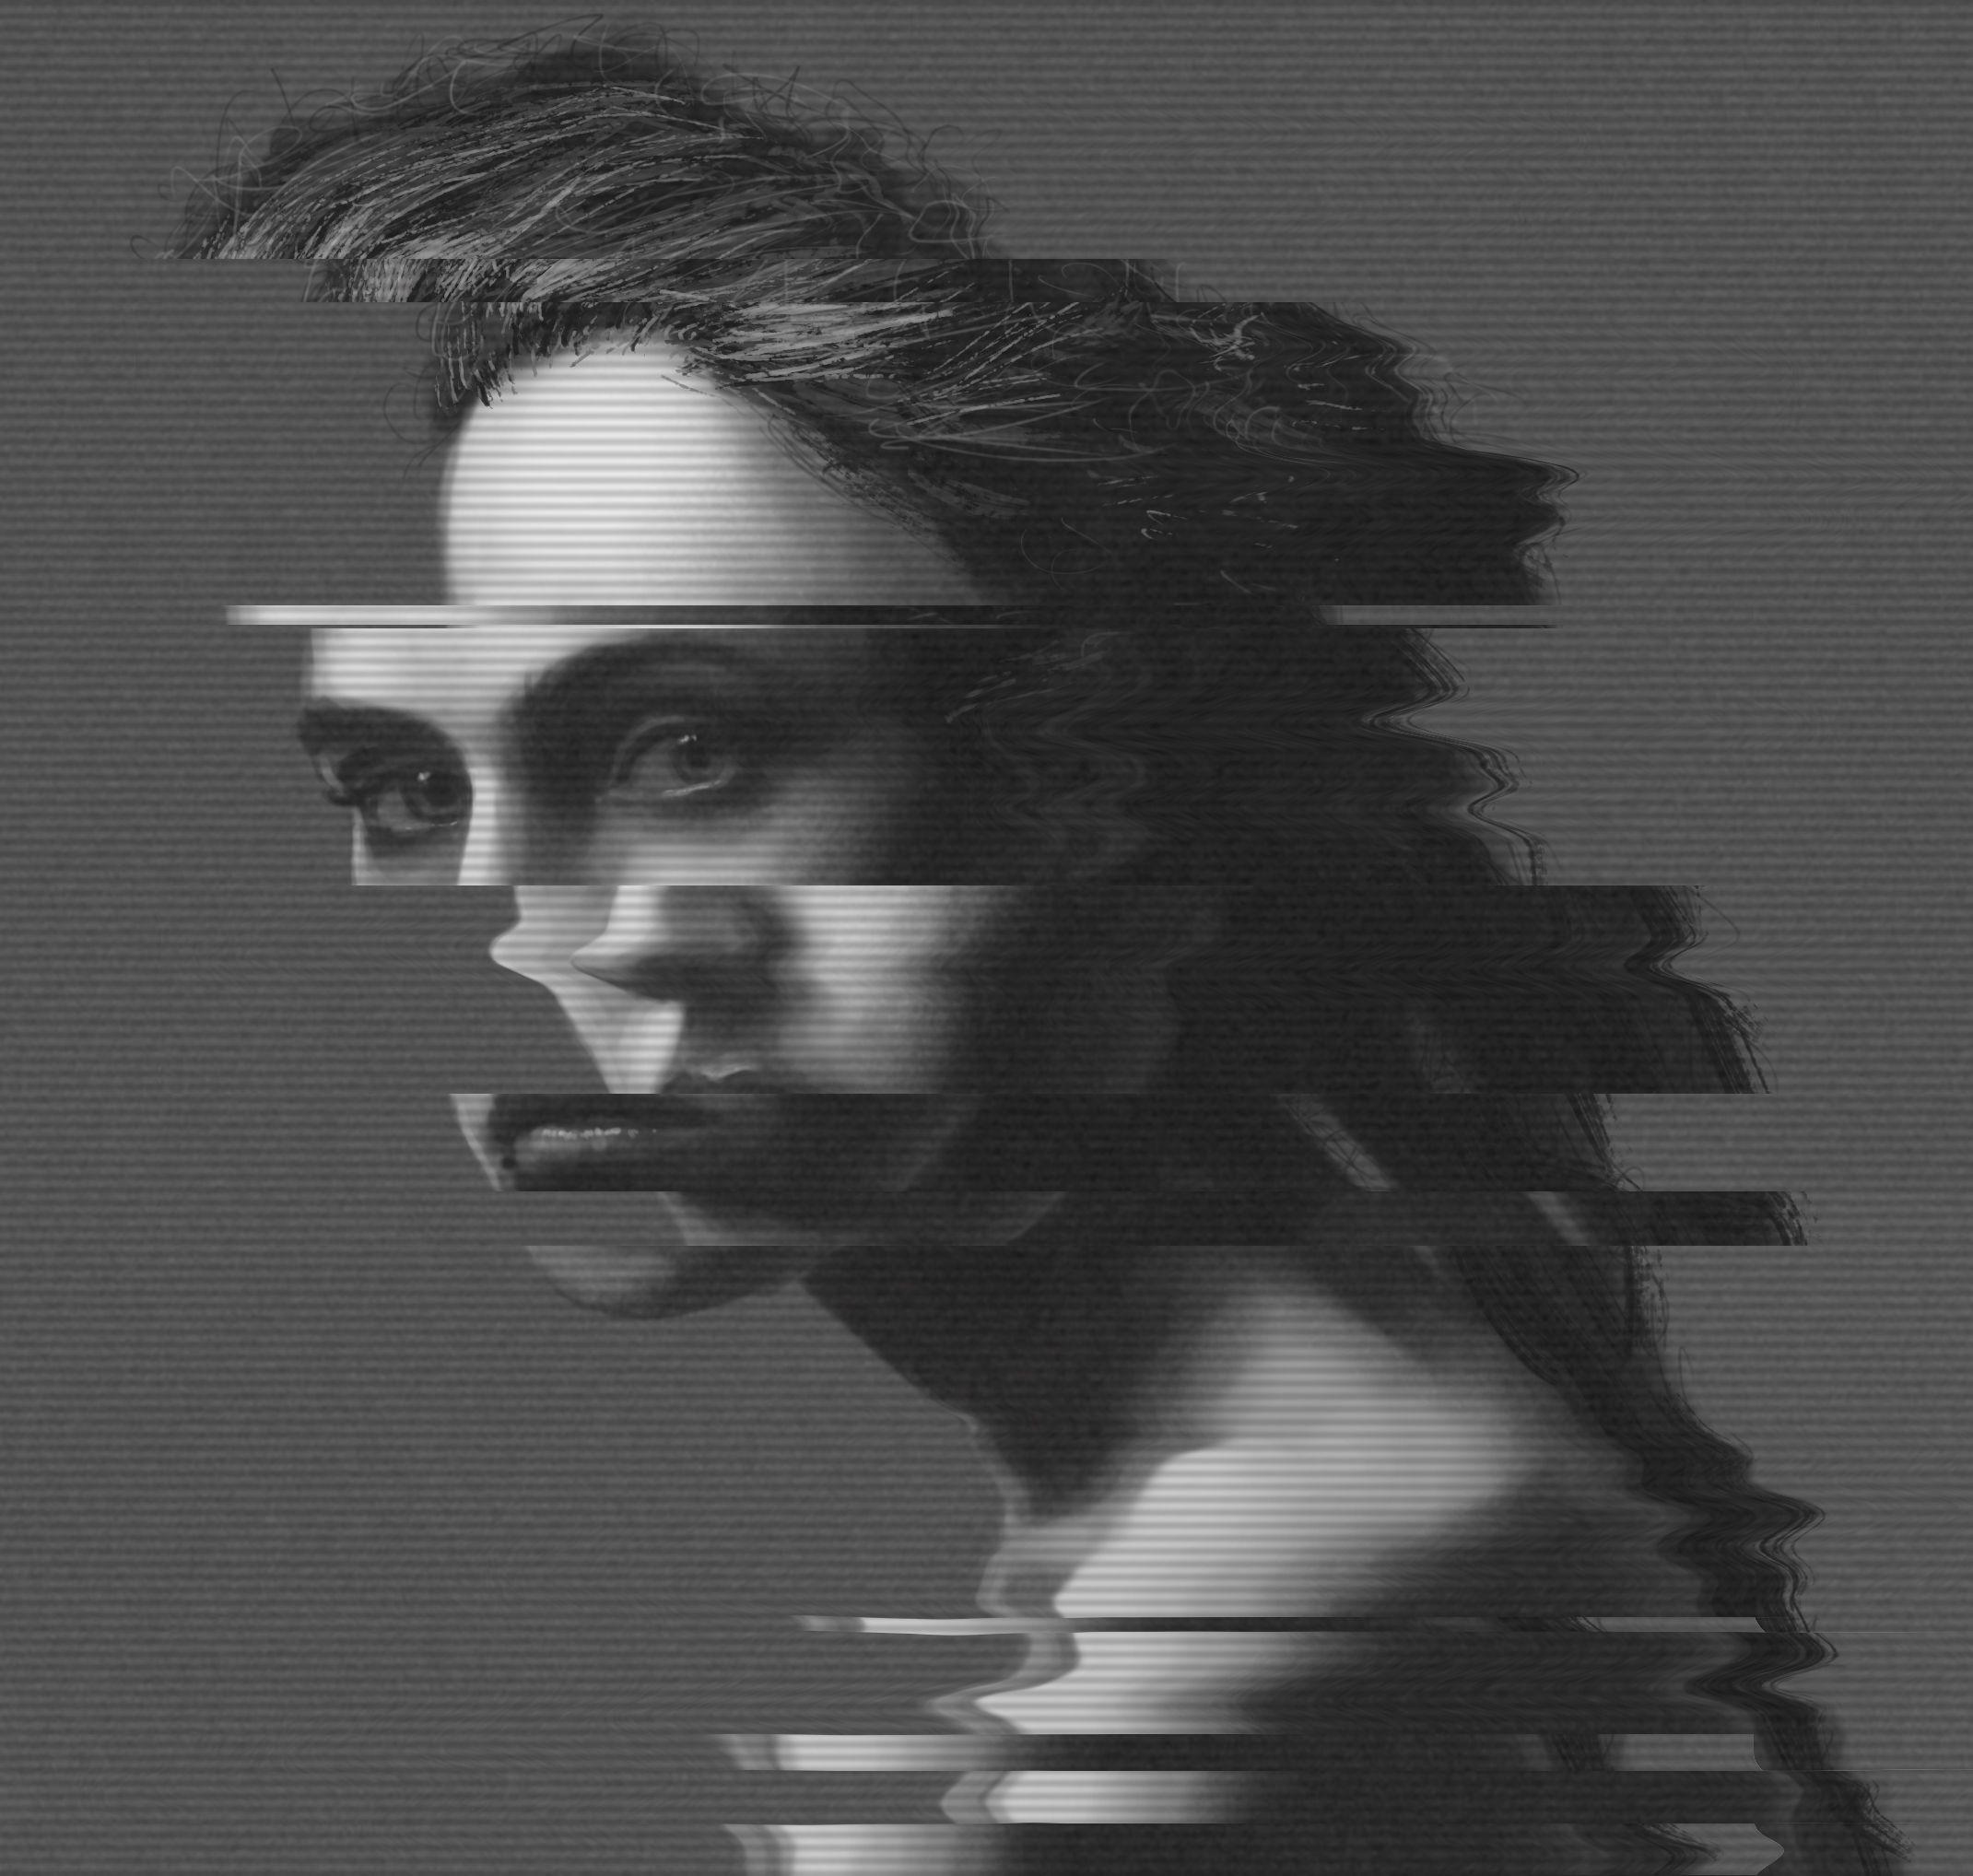 Digital Portrait Of Girl With Photoshop Distortion Effects By Yasha Puzankov Fotos De Fotografia Retoque Fotografico Fotografia Publicitaria